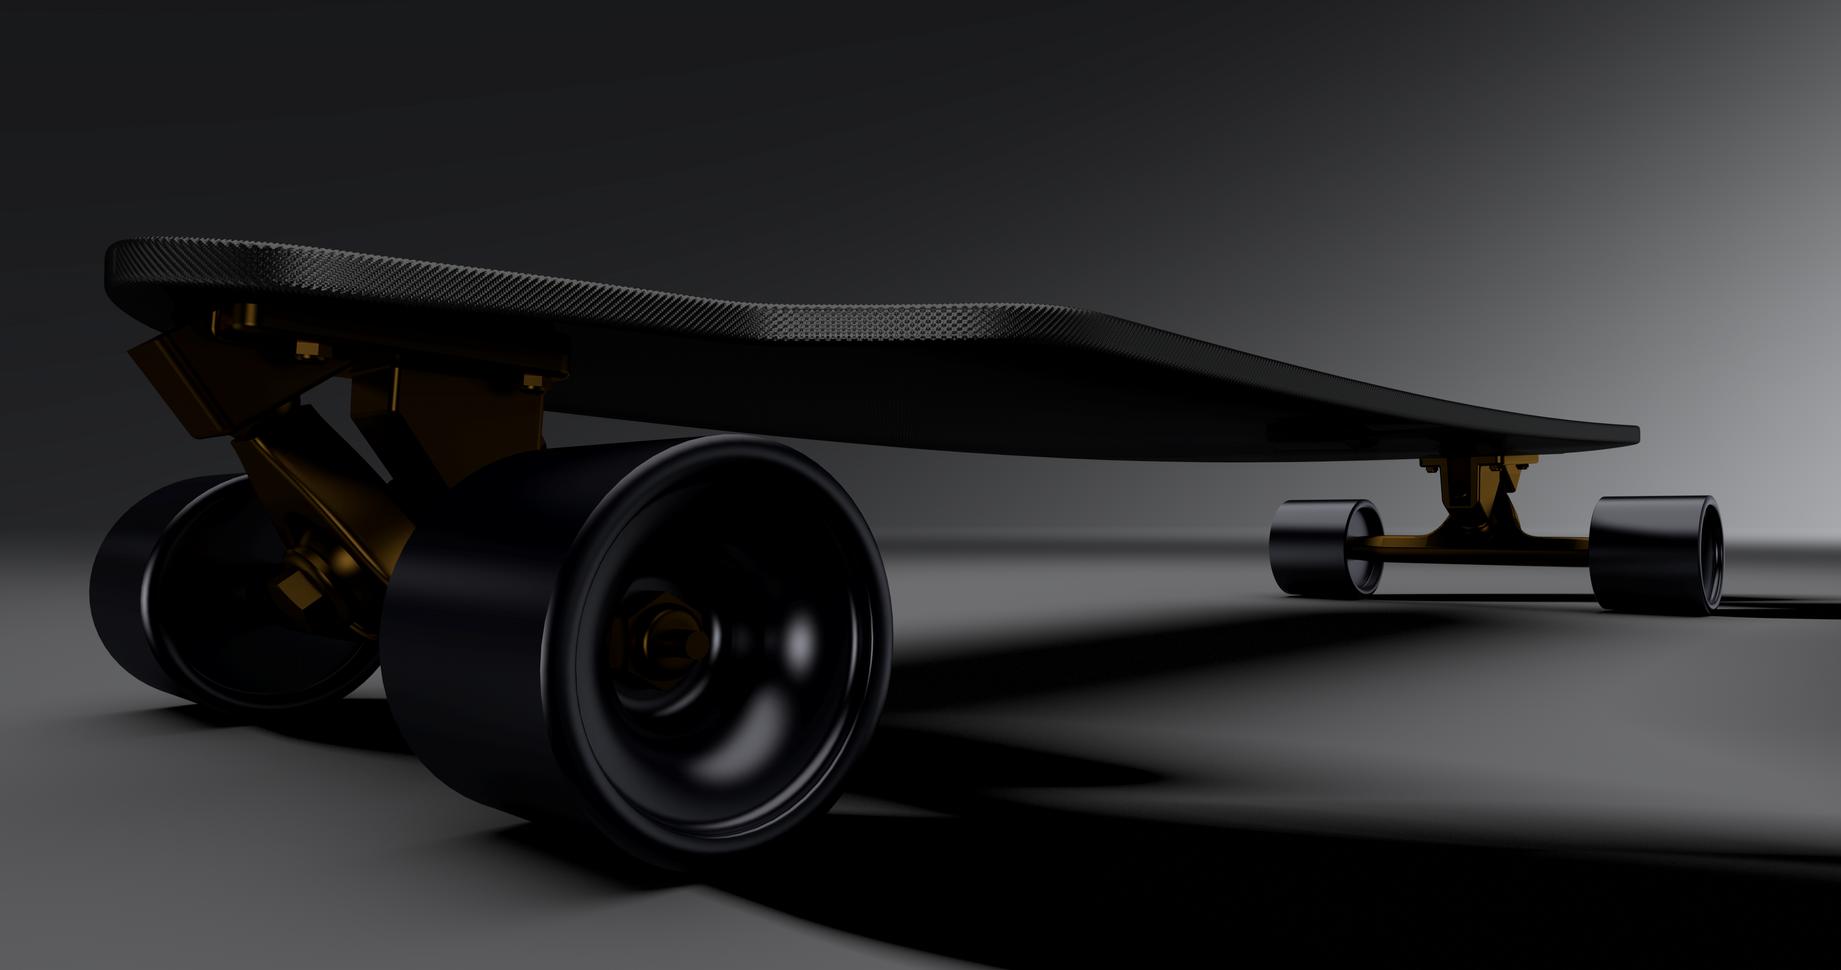 Longboard Low Axle Angle6.png